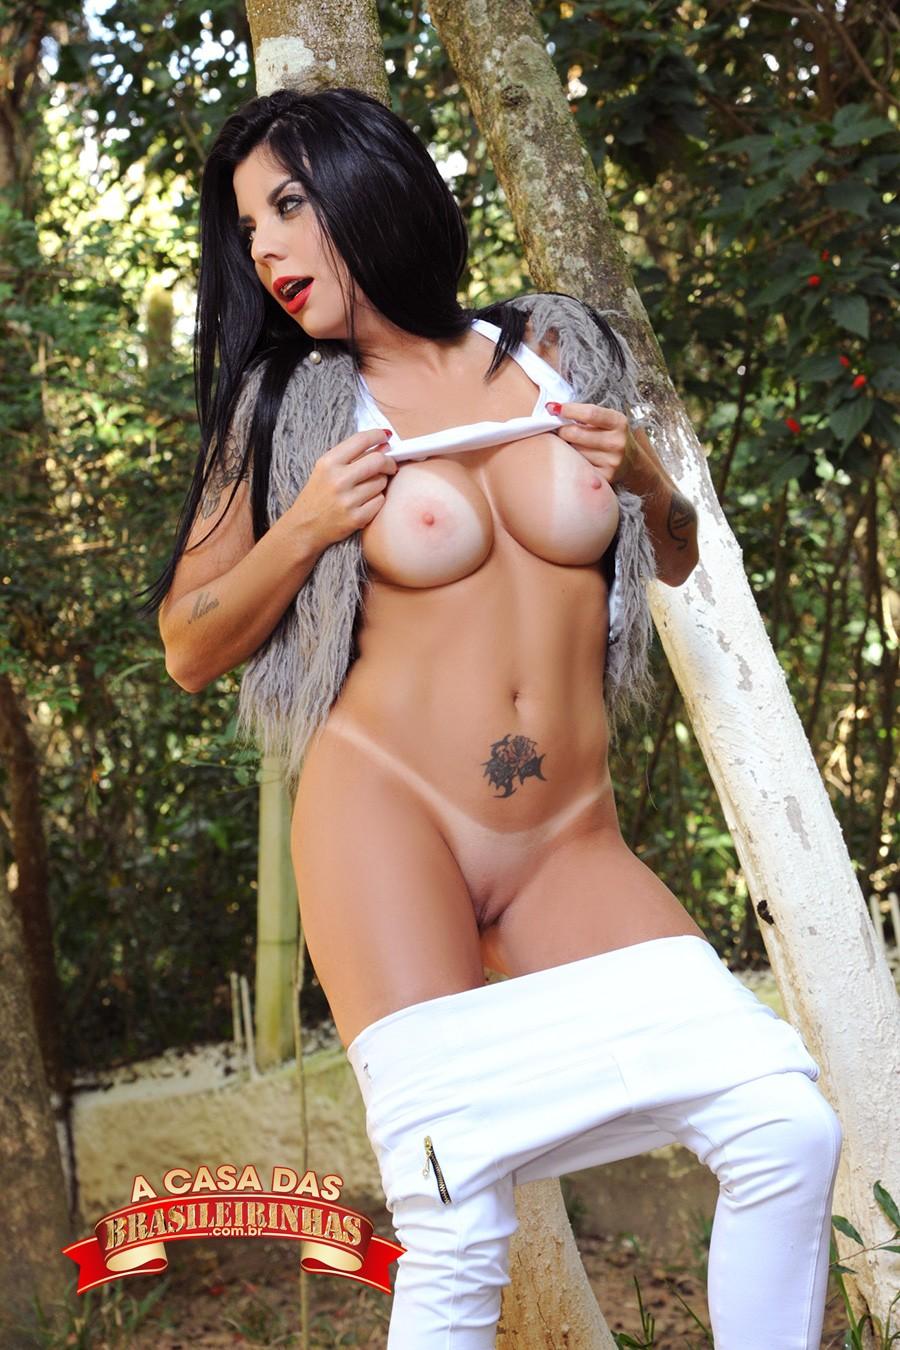 Milena-Sato-tirando-o-top.jpg